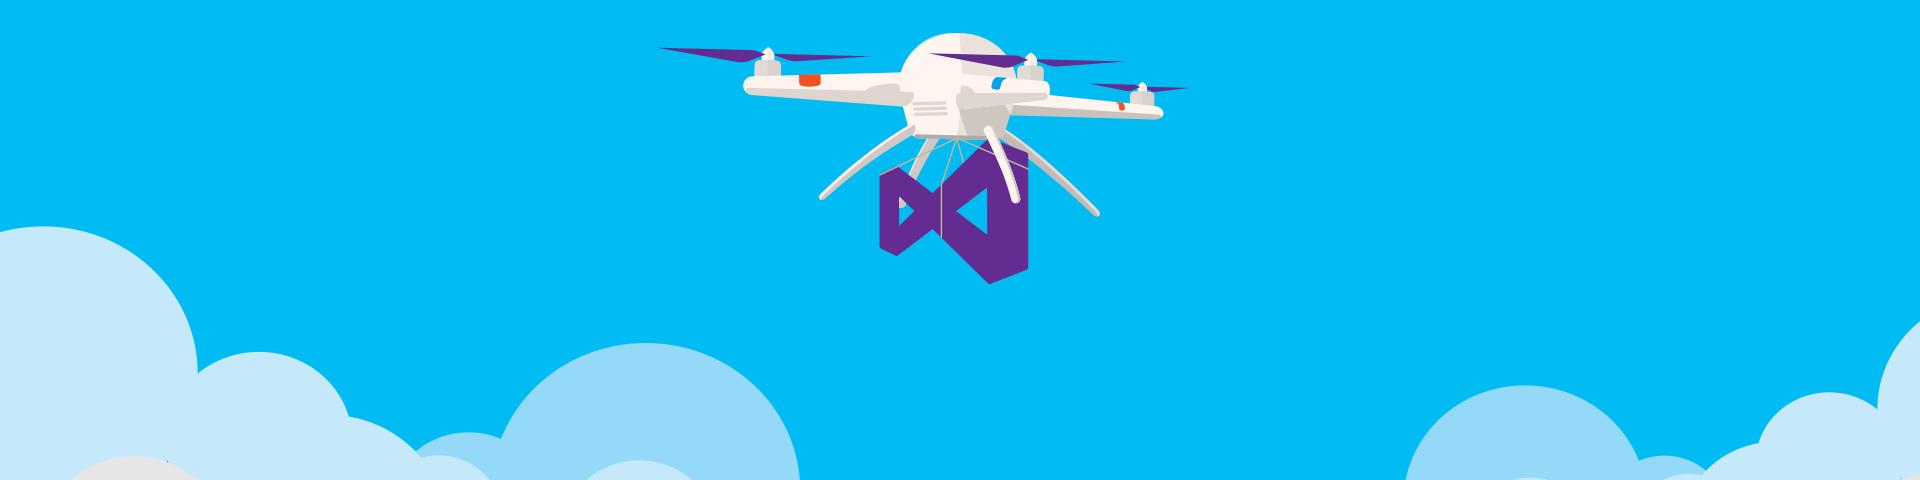 Obrázek letícího dronu s logem Visual Studio